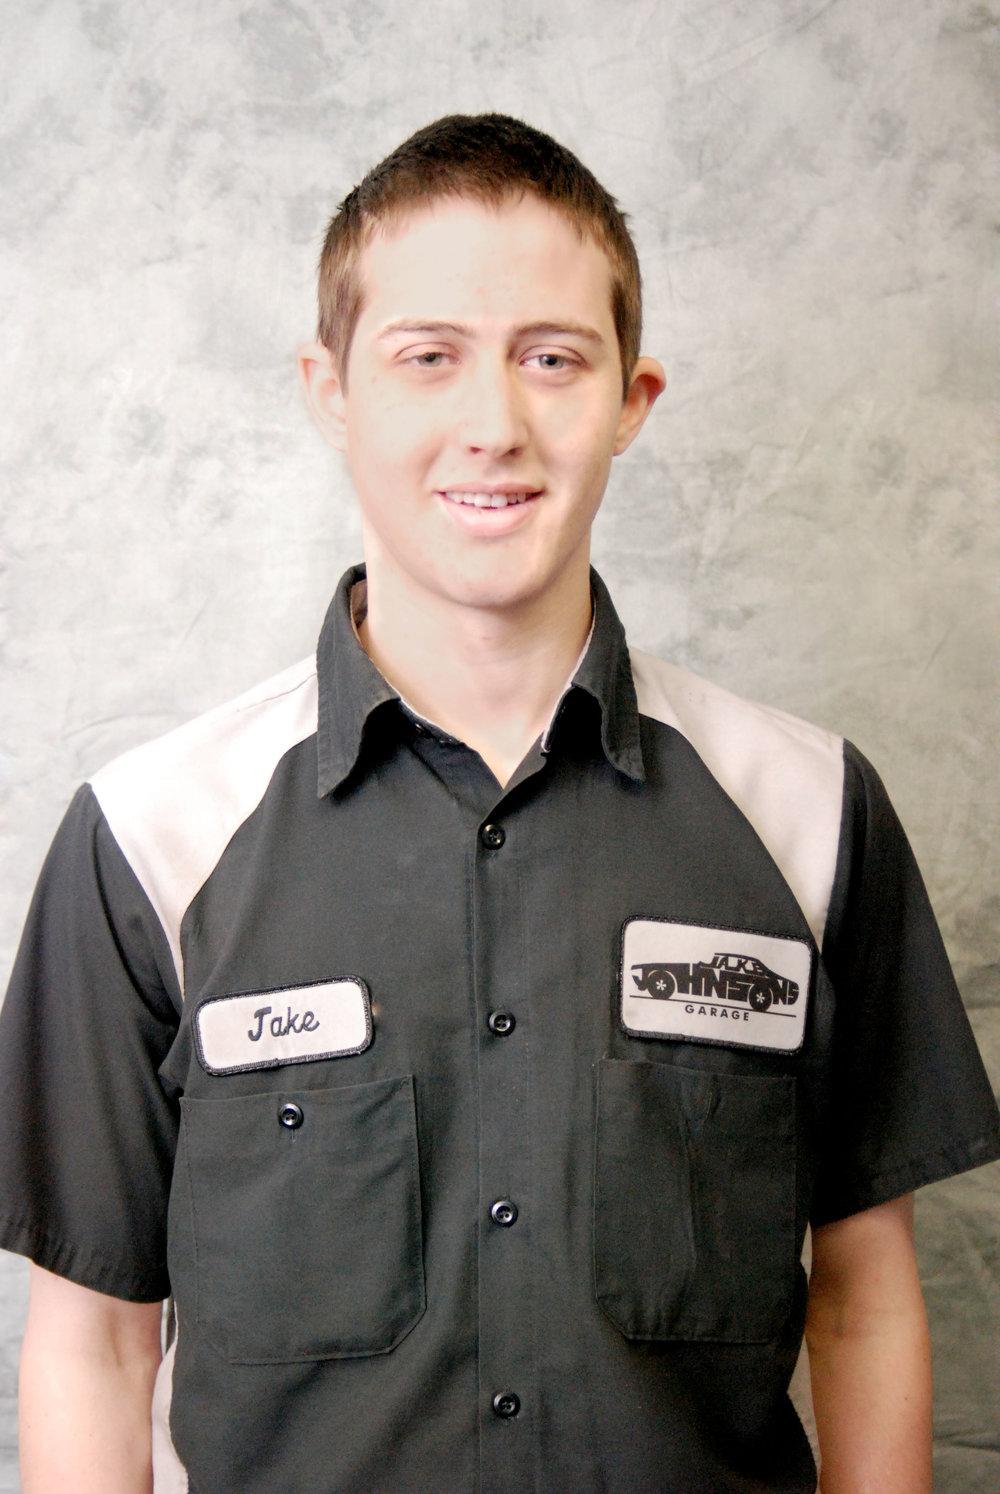 Jake Johnson - Operations Manager